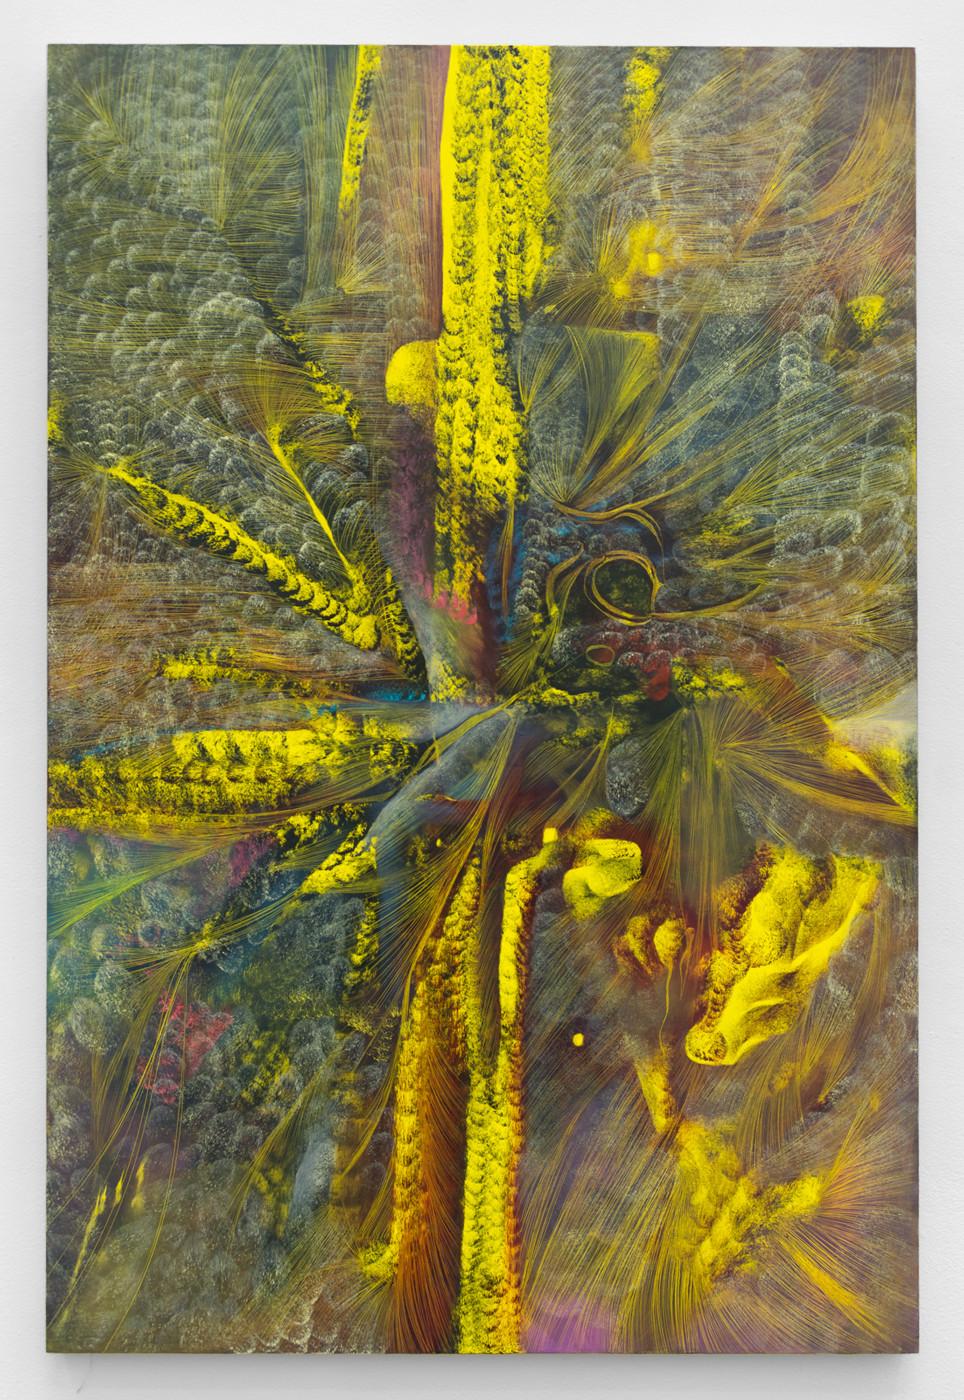 LUCY BULL  Crimson Suspicion , 2019 Oil on linen 152,4 x 101,6 cm / 60 x 40 in - High Art Gallery Paris